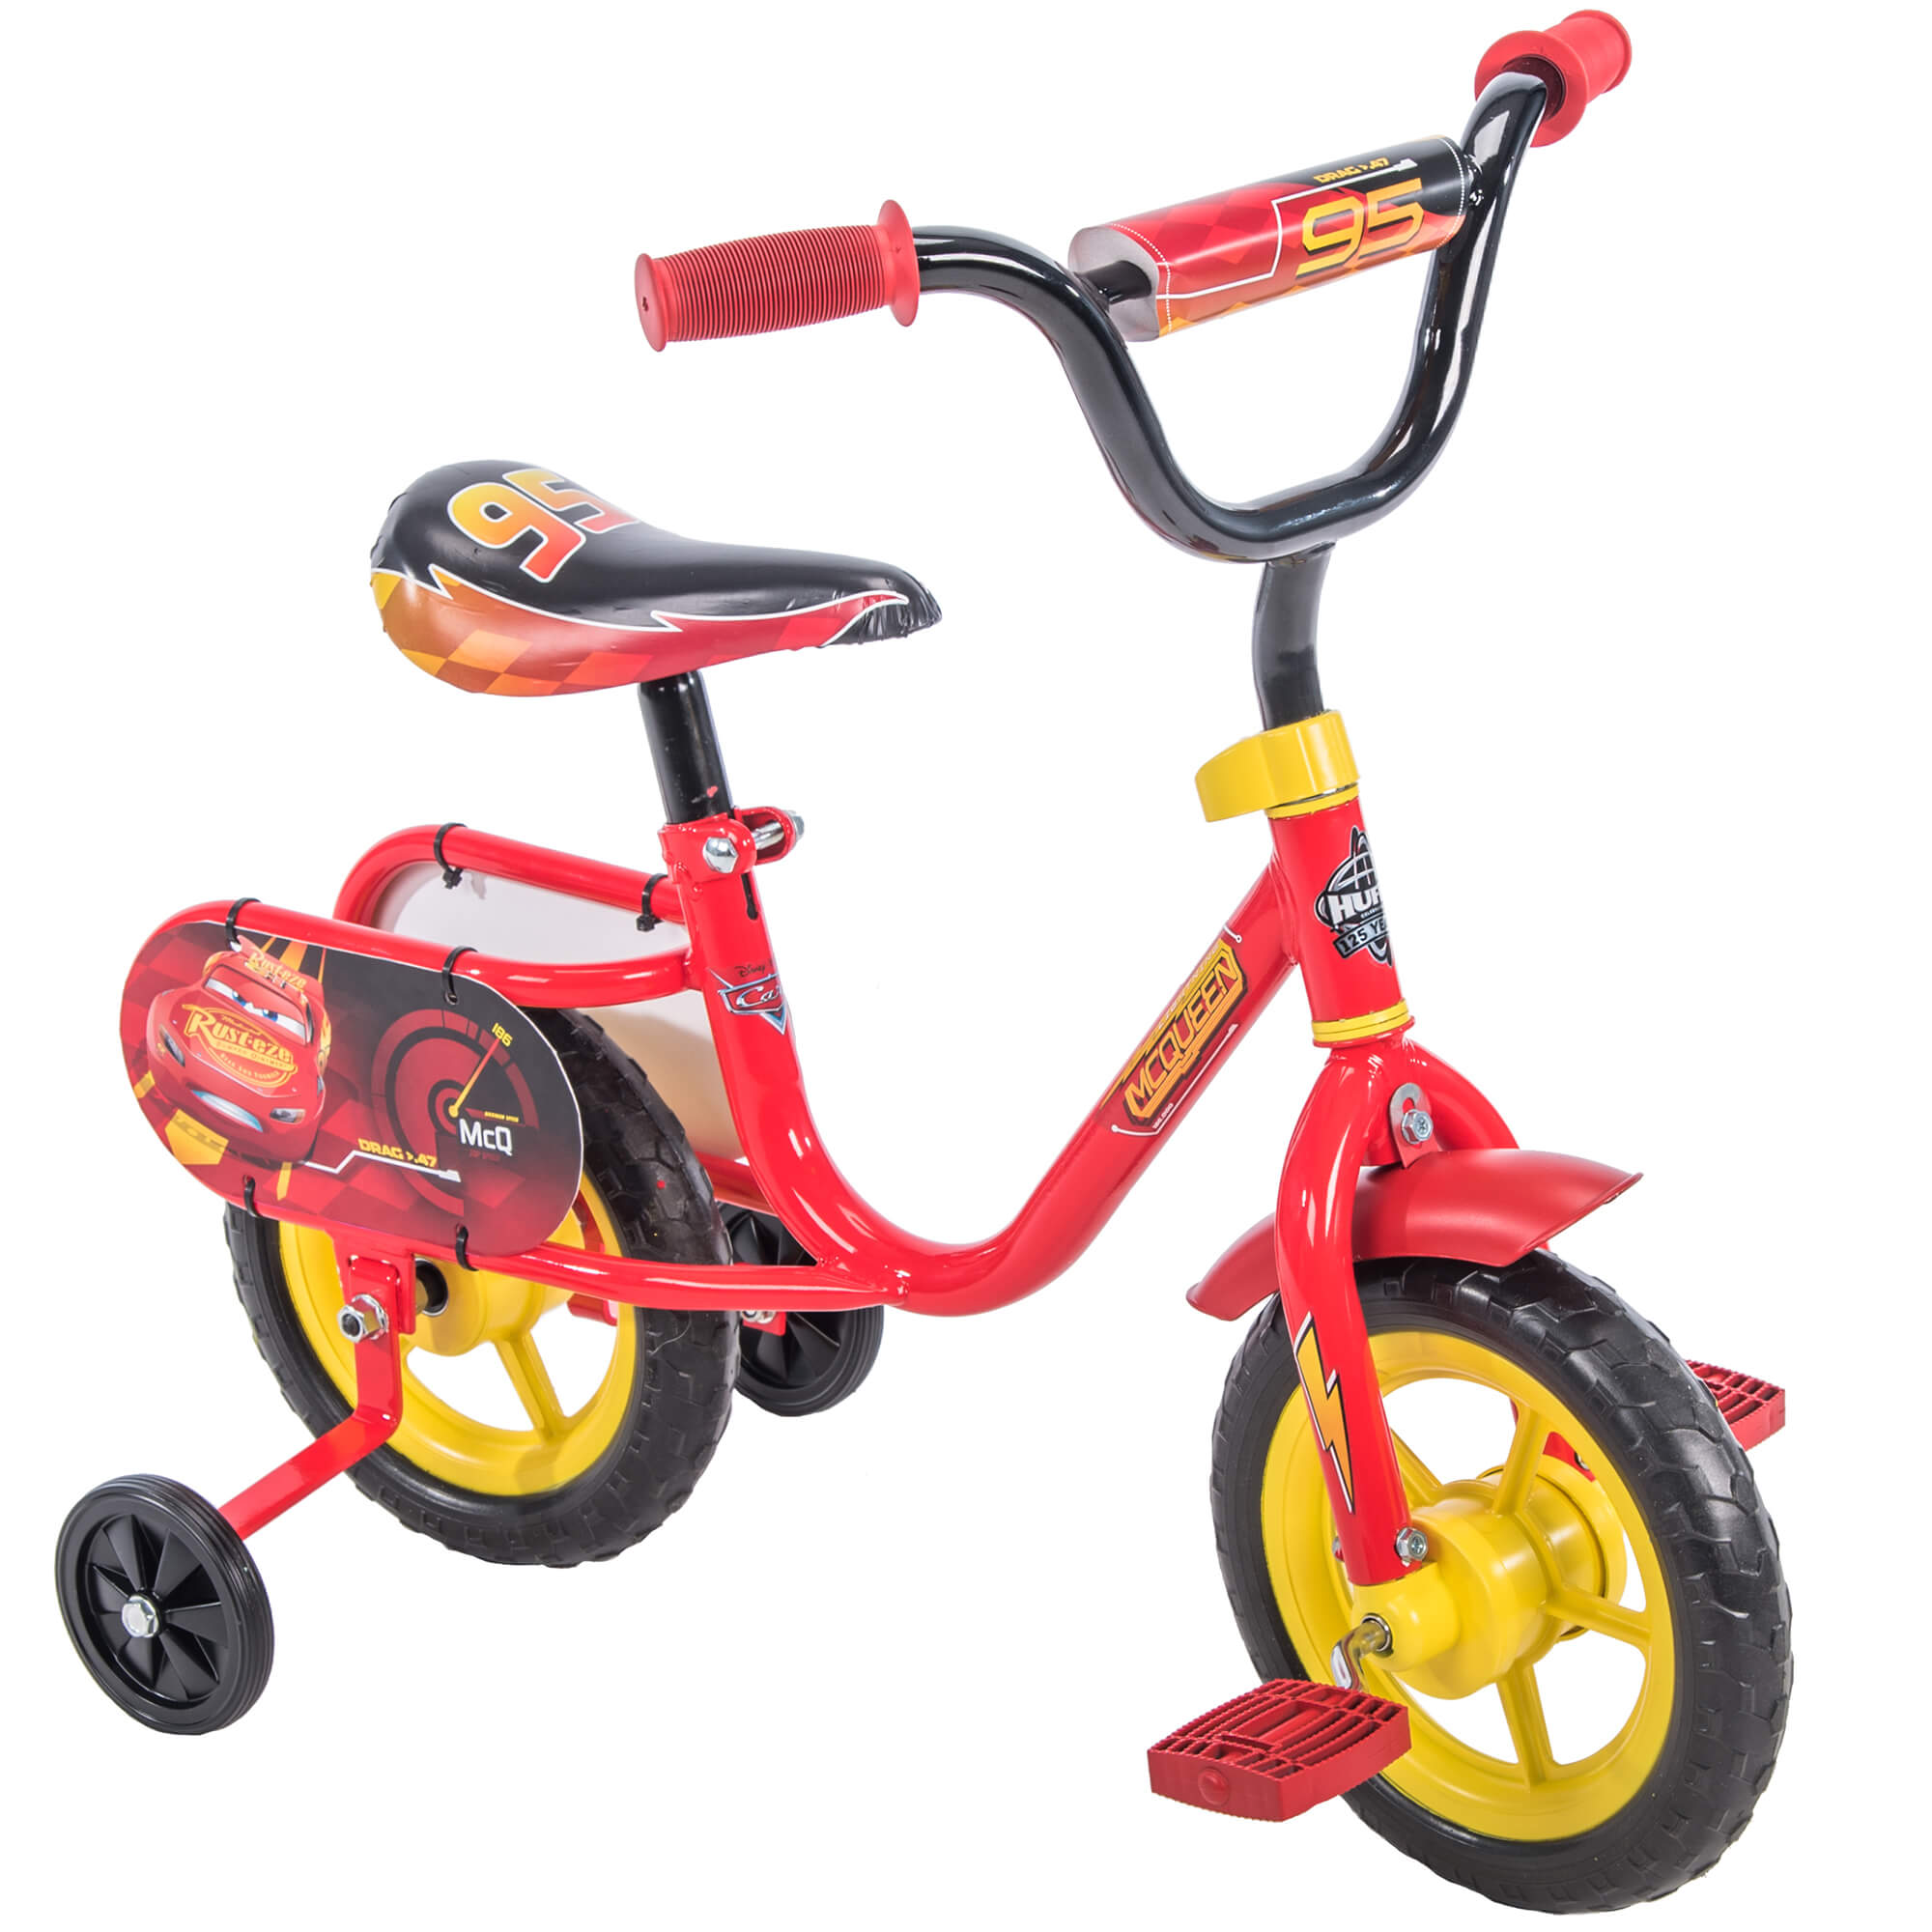 "Disney   Pixar Cars Lightning McQueen 10"" Boys' Pedal Bike by Huffy by Huffy"